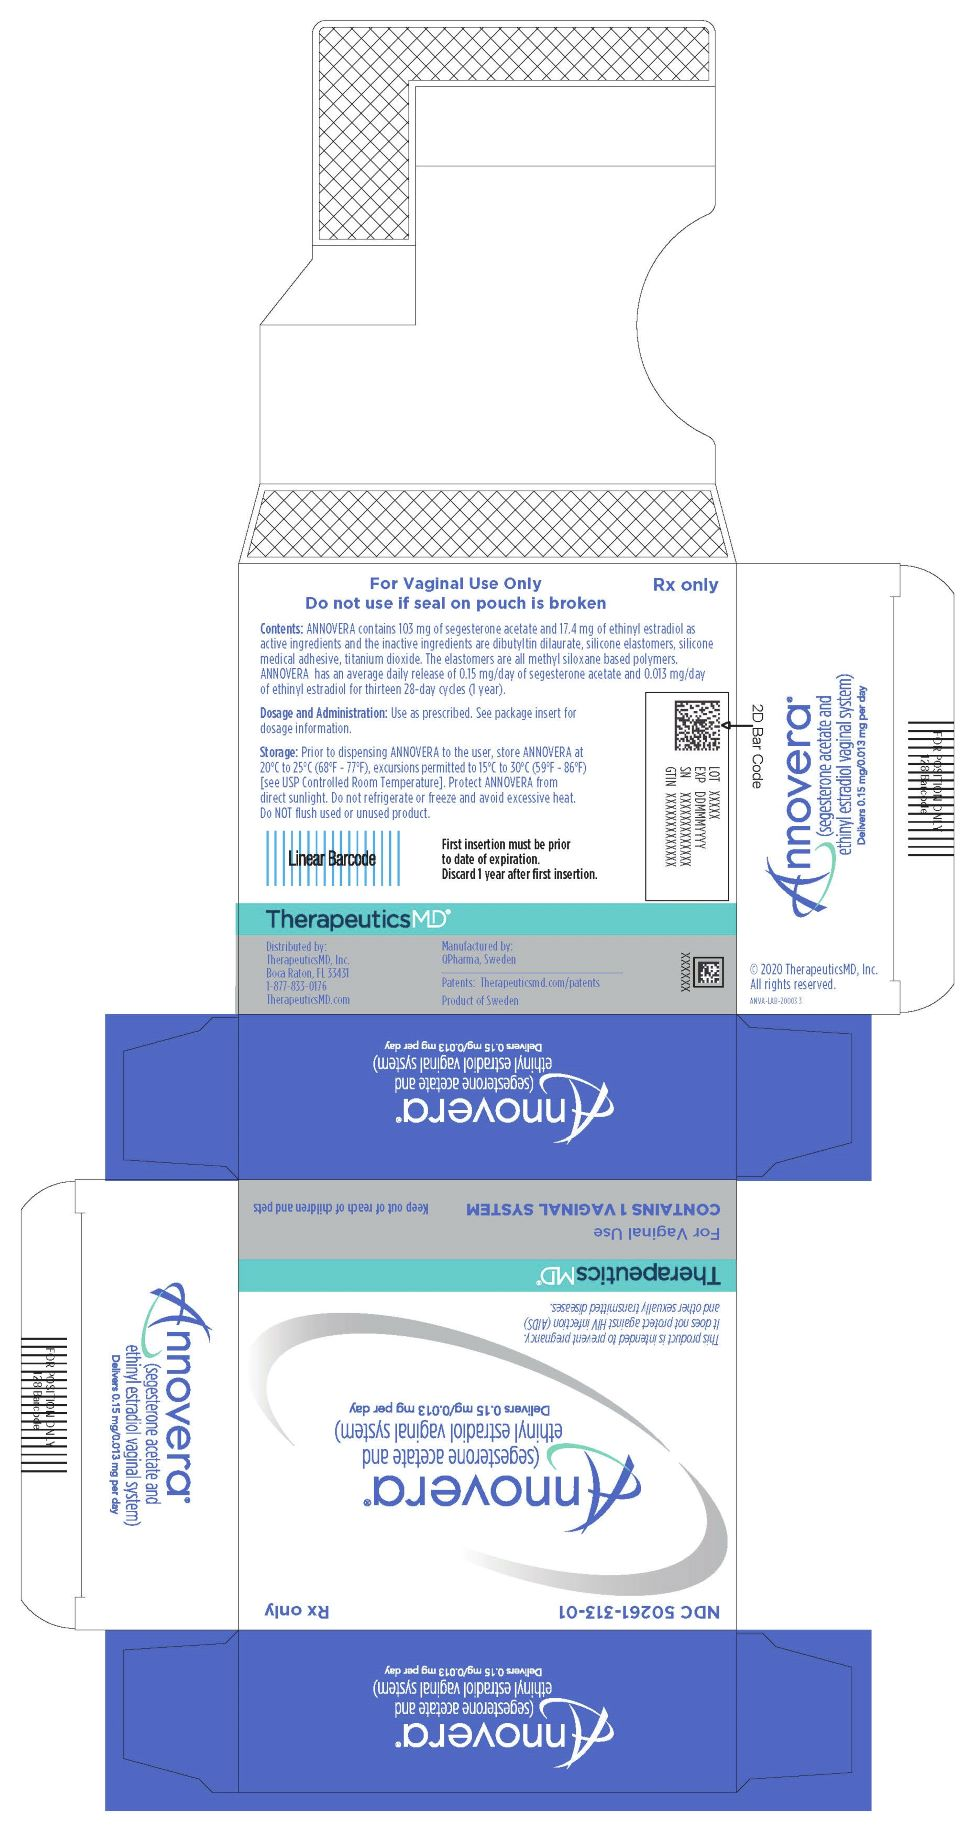 Rx Item-ANNOVERA segesterone ac/ethin estradiol  VAG RING .15-.013MG VAGINAL SYS